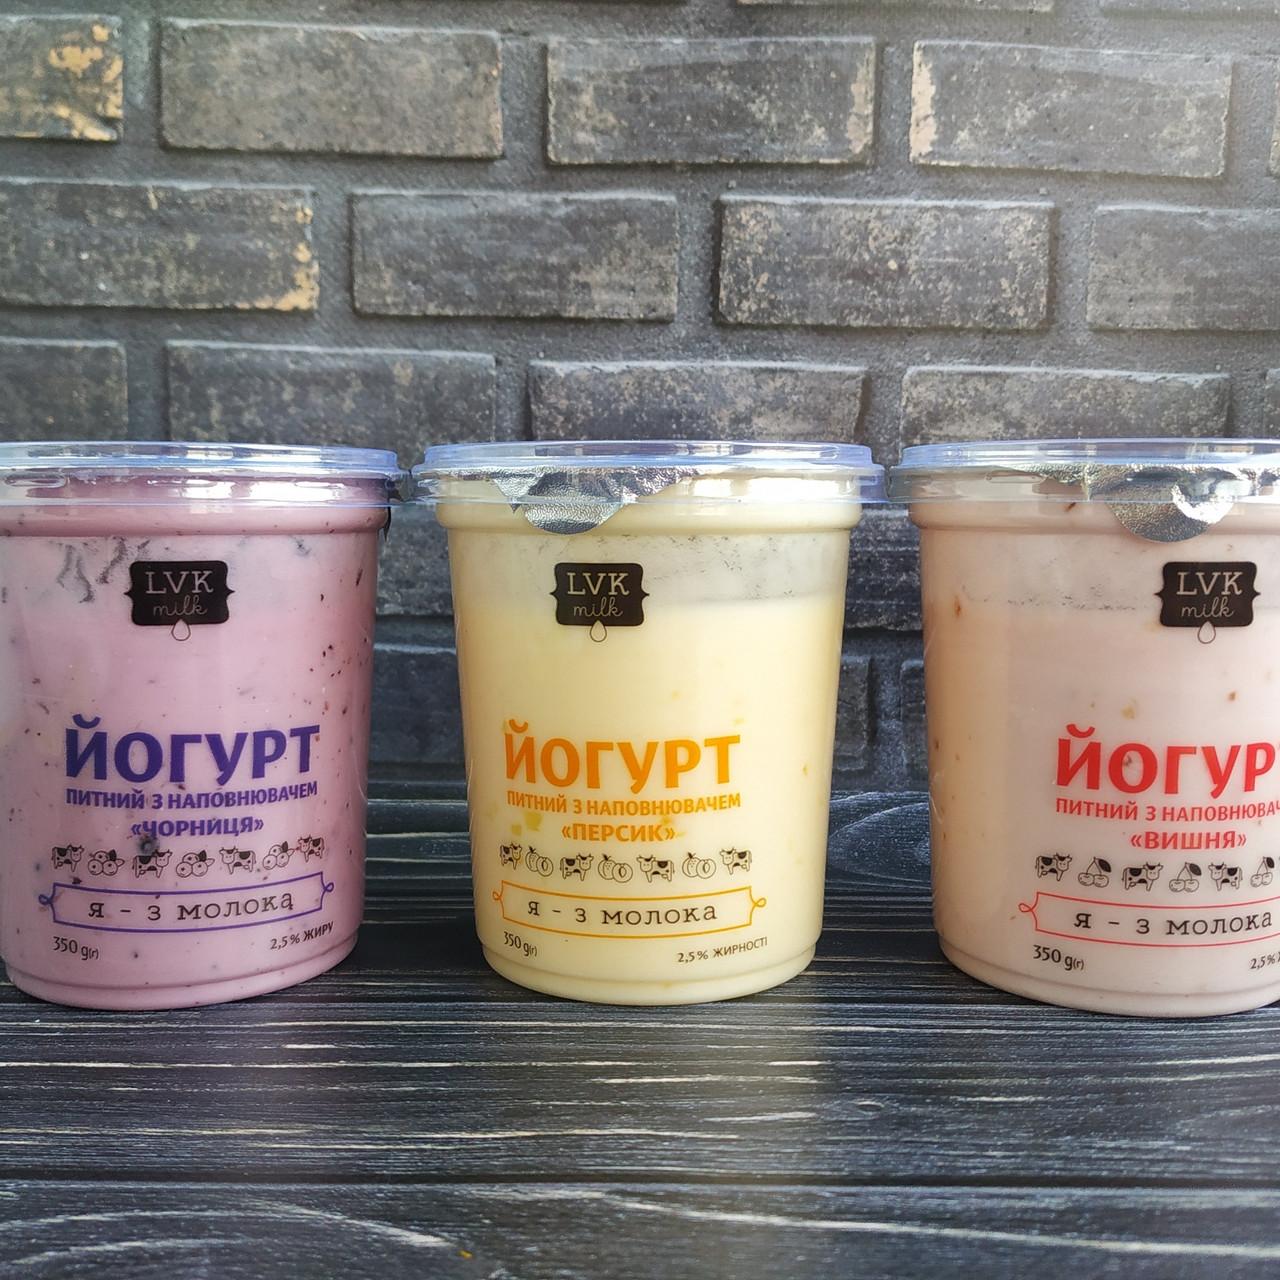 Йогурт питний з чорницею 350г LVK milk